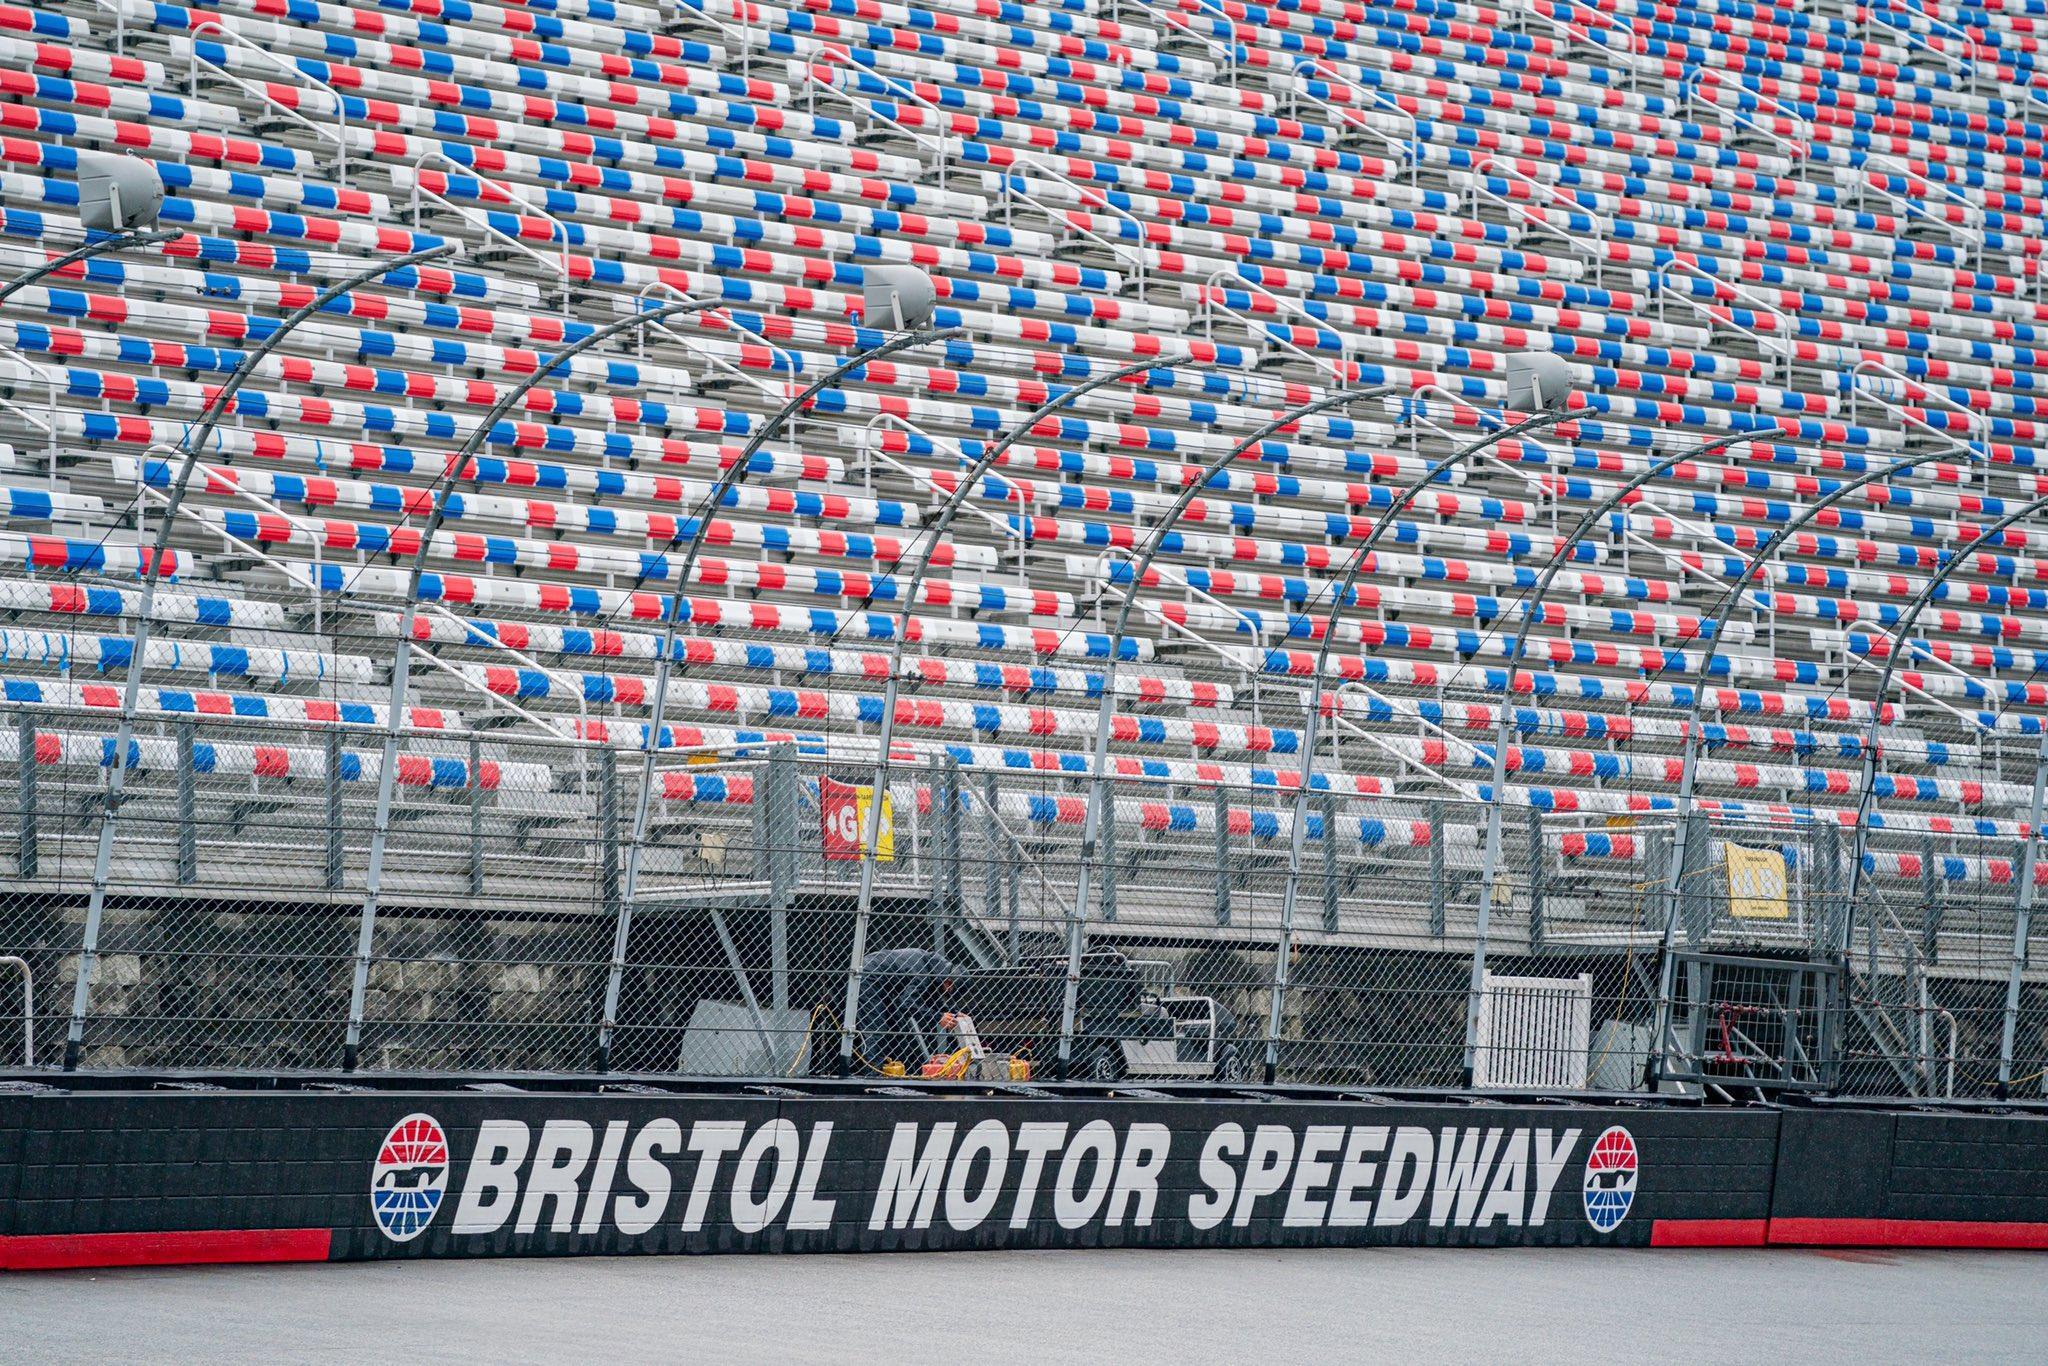 Bristol Race Results: September 17, 2020 (ARCA Menards Series) - Racing News